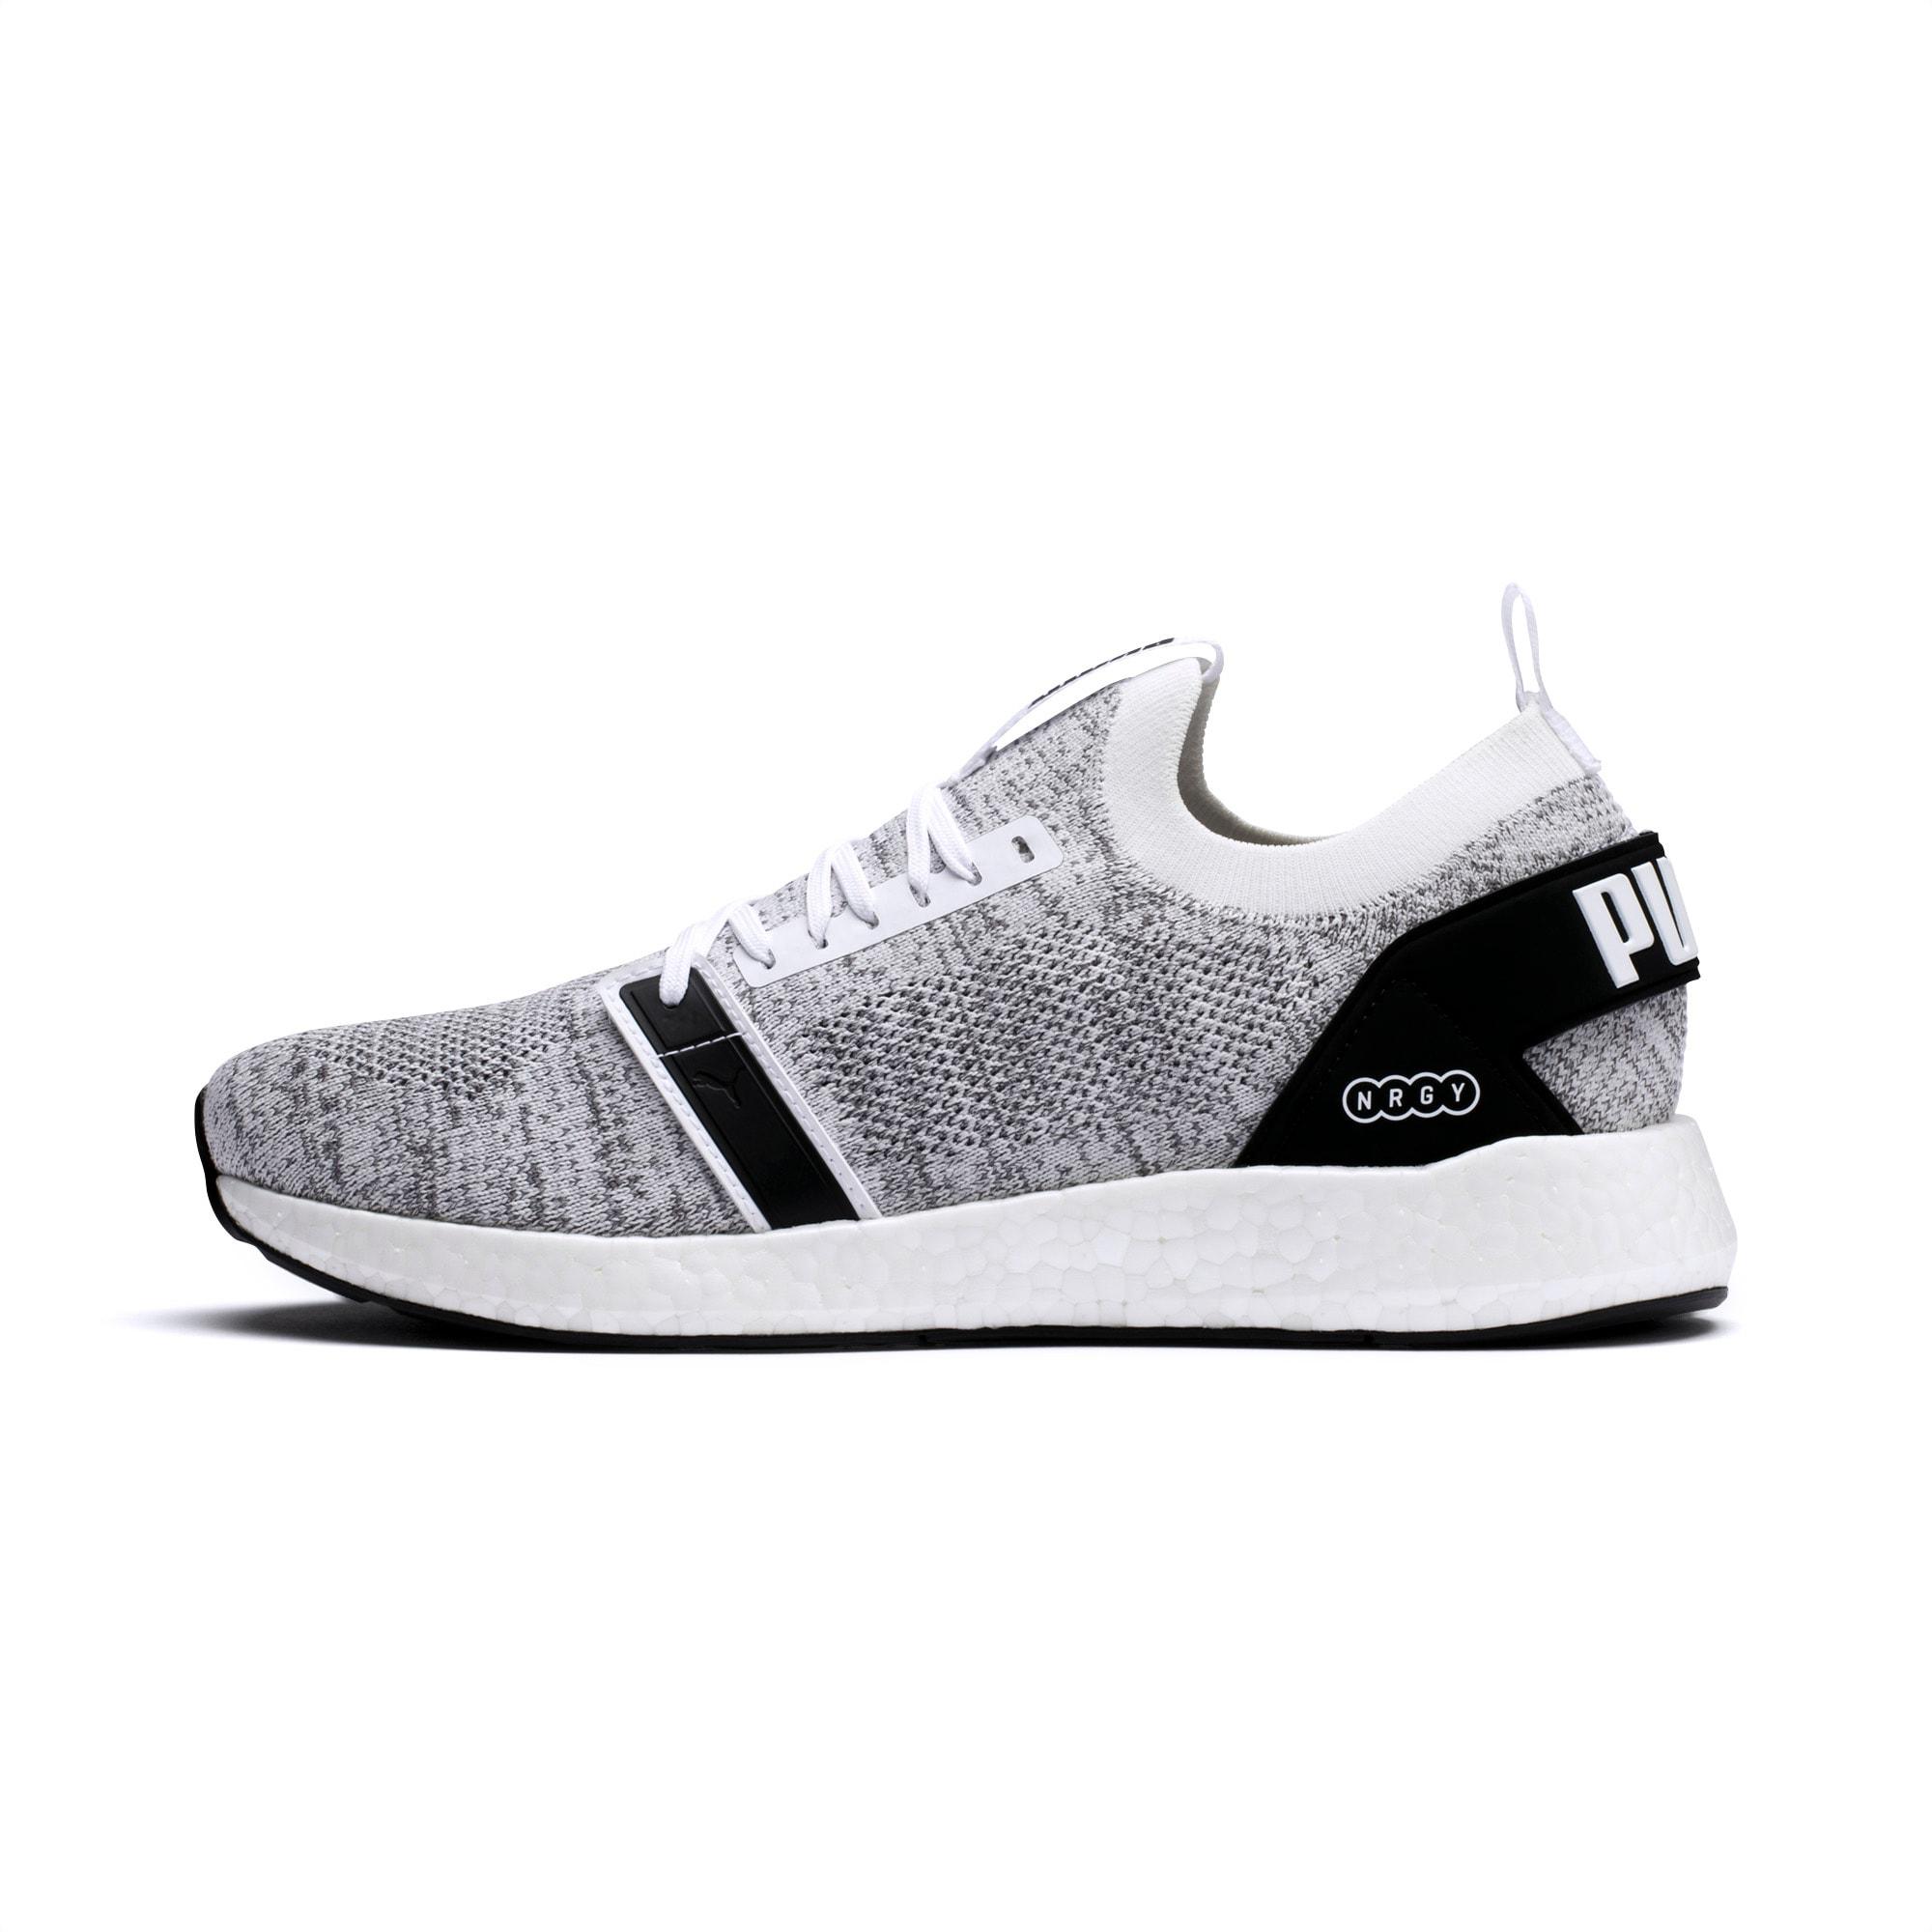 niebla tóxica poco claro Mediana  NRGY NEKO ENGINEER KNIT Men's Running Shoes | Puma White-Puma Black | PUMA  Shoes | PUMA